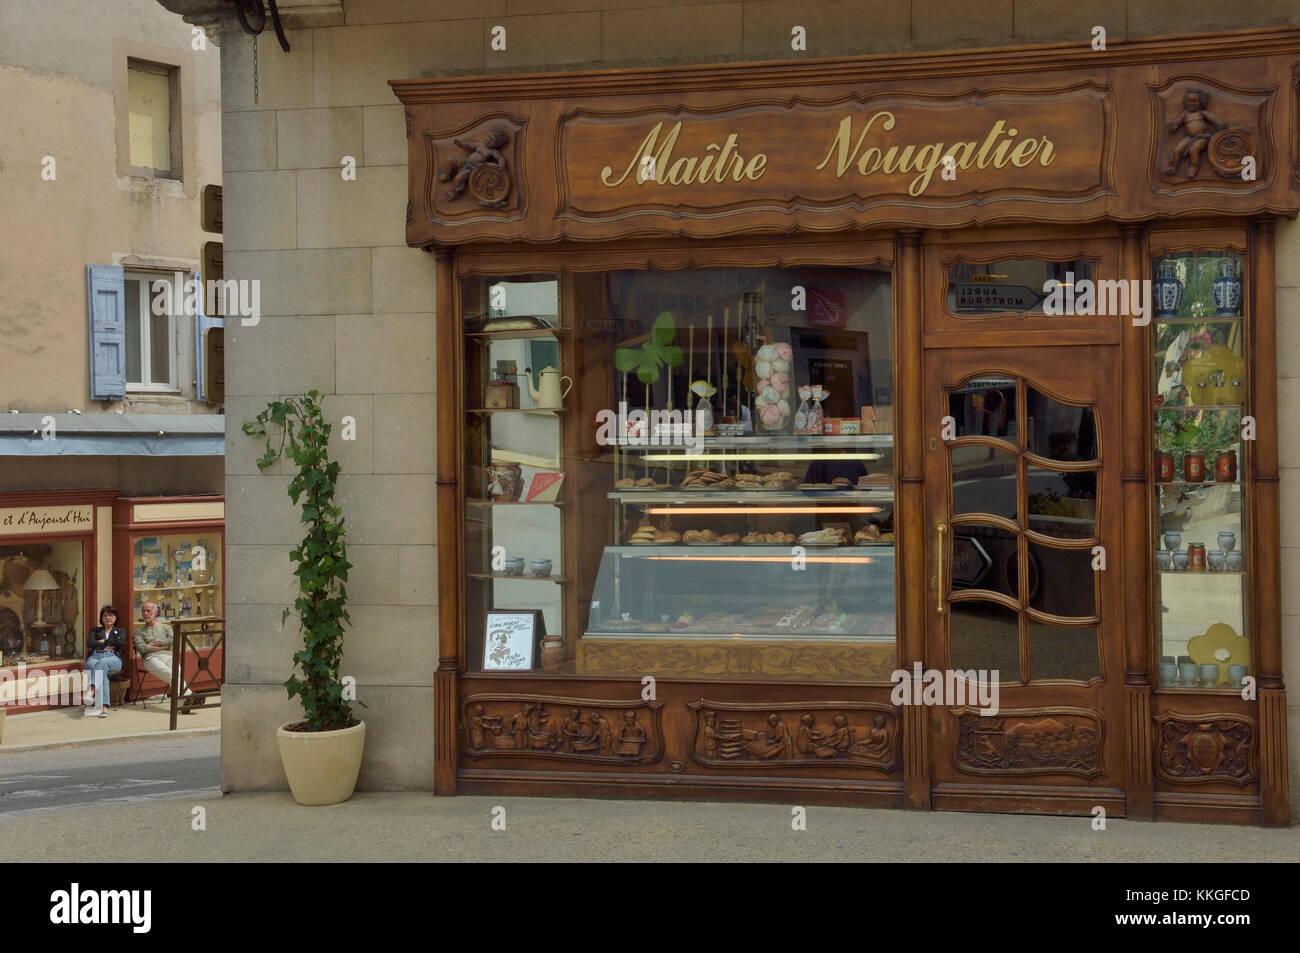 10039fdfb05c86 André Boyer nougat boutique, sault, Provence, France Photo Stock